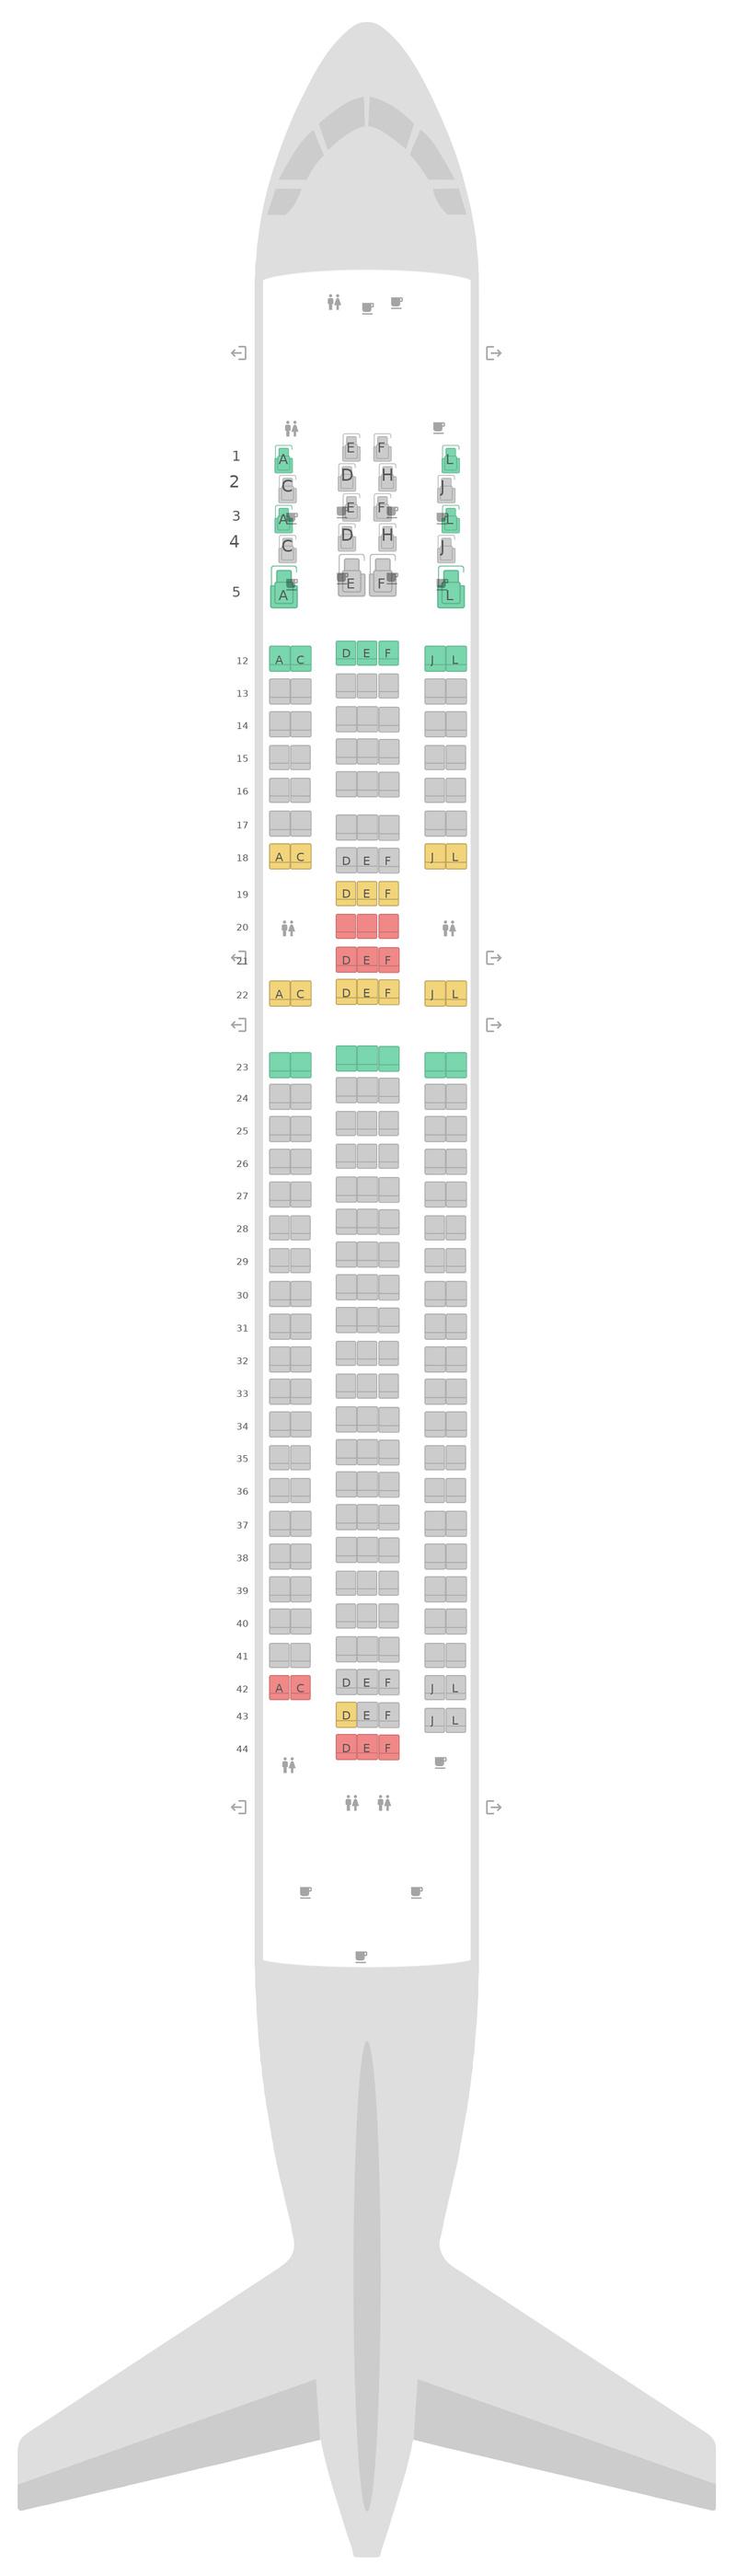 Схема салона Боинг 767-300ER v1 LATAM